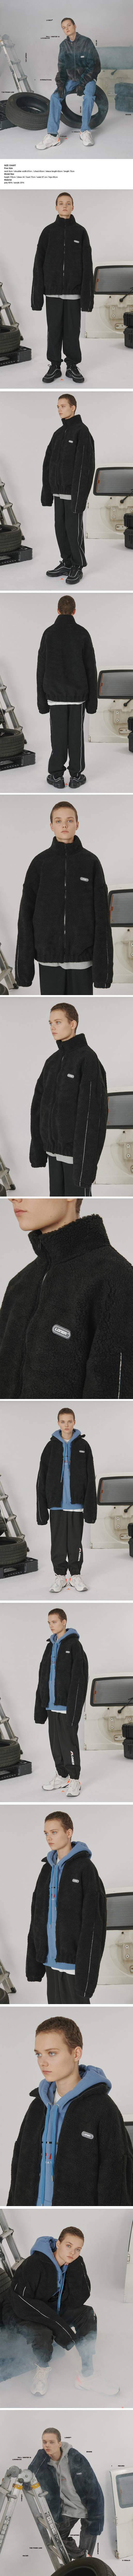 High neck fleece zipup_black.jpg